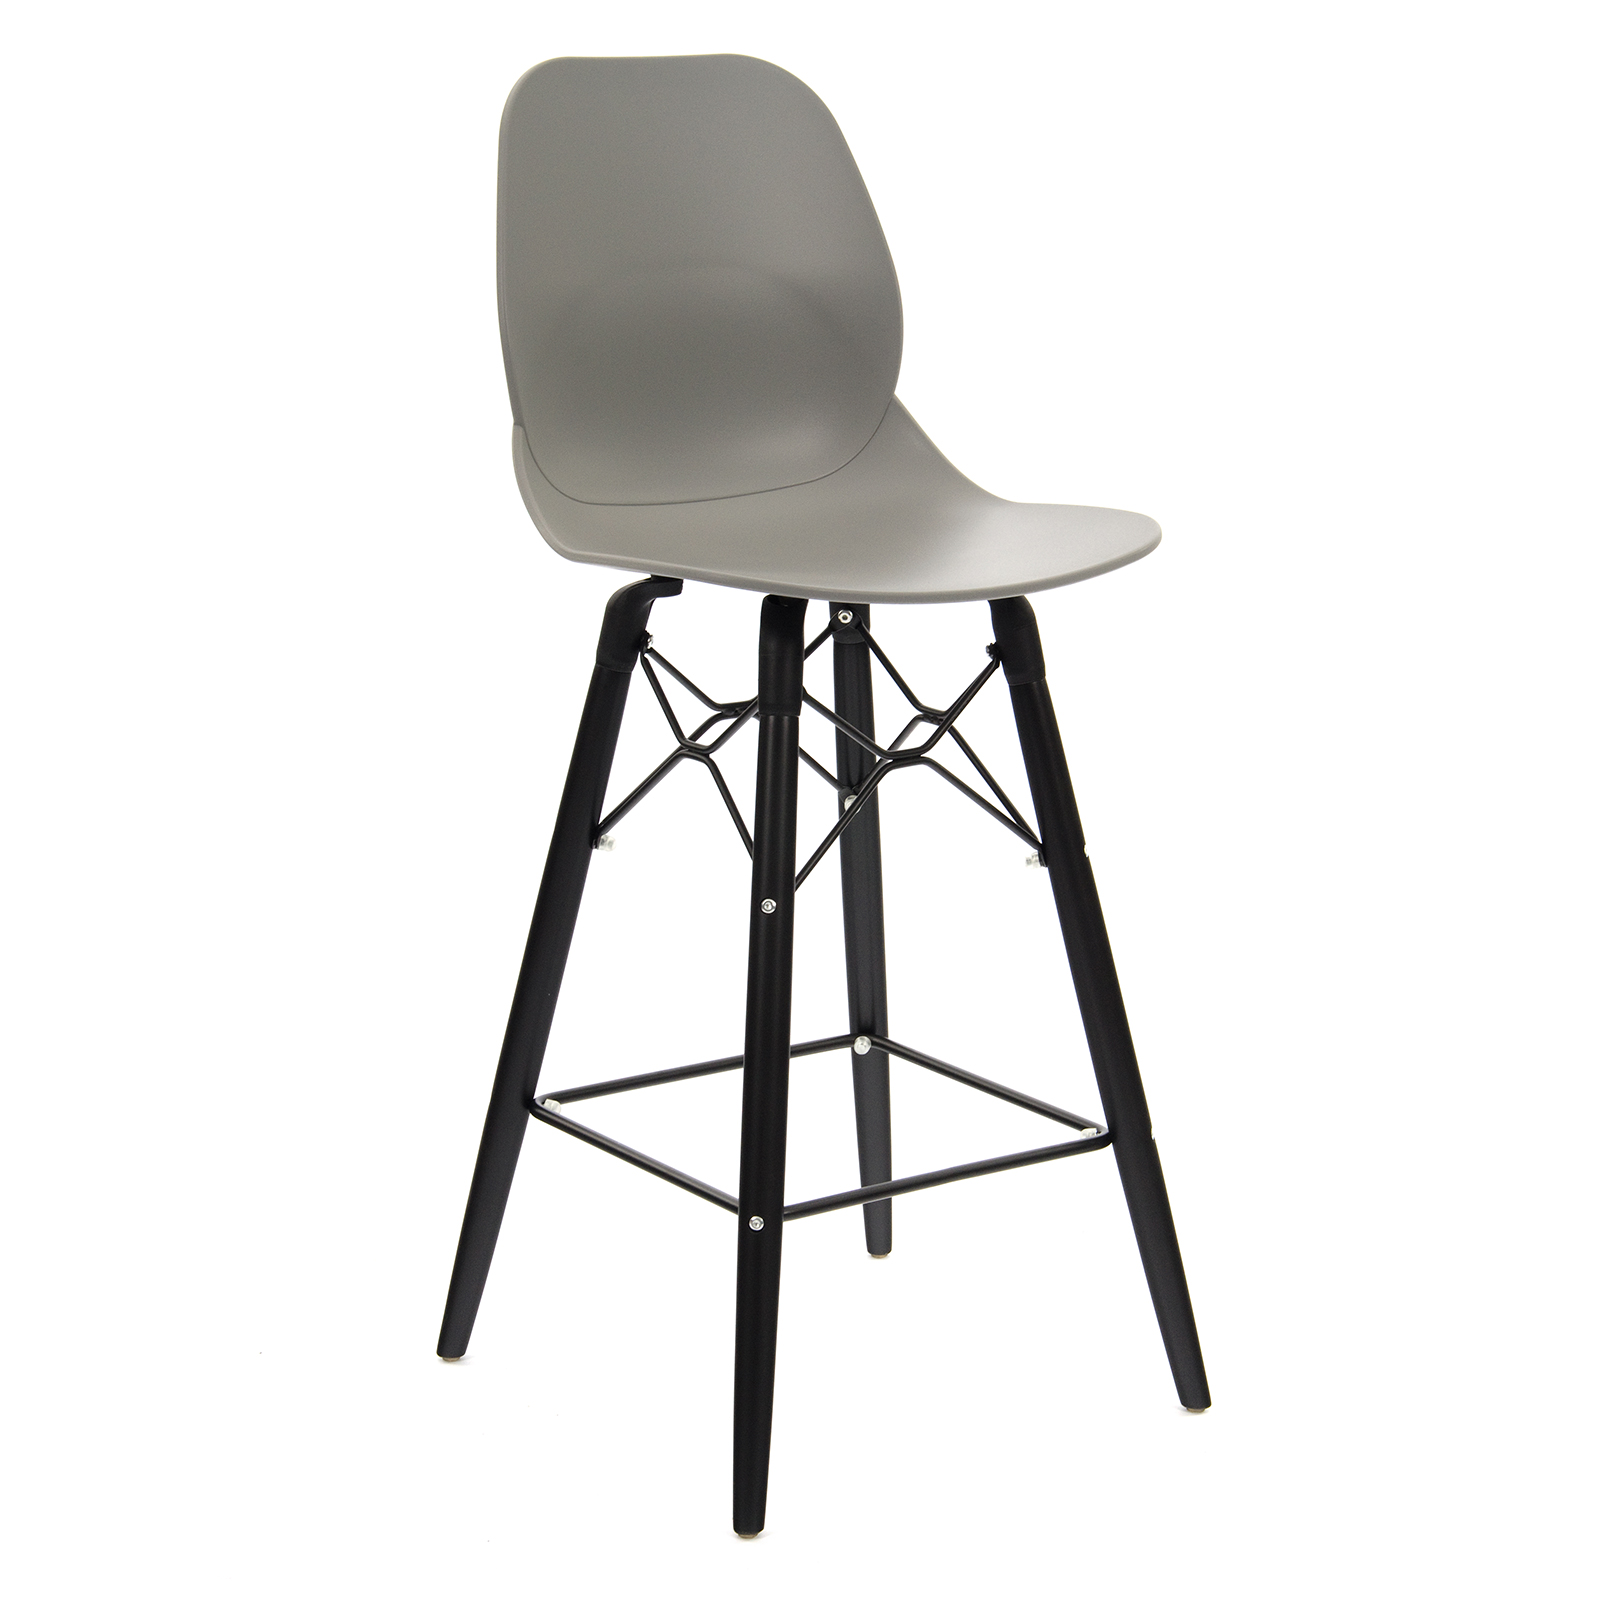 Strut multi-purpose stool with black steel frame